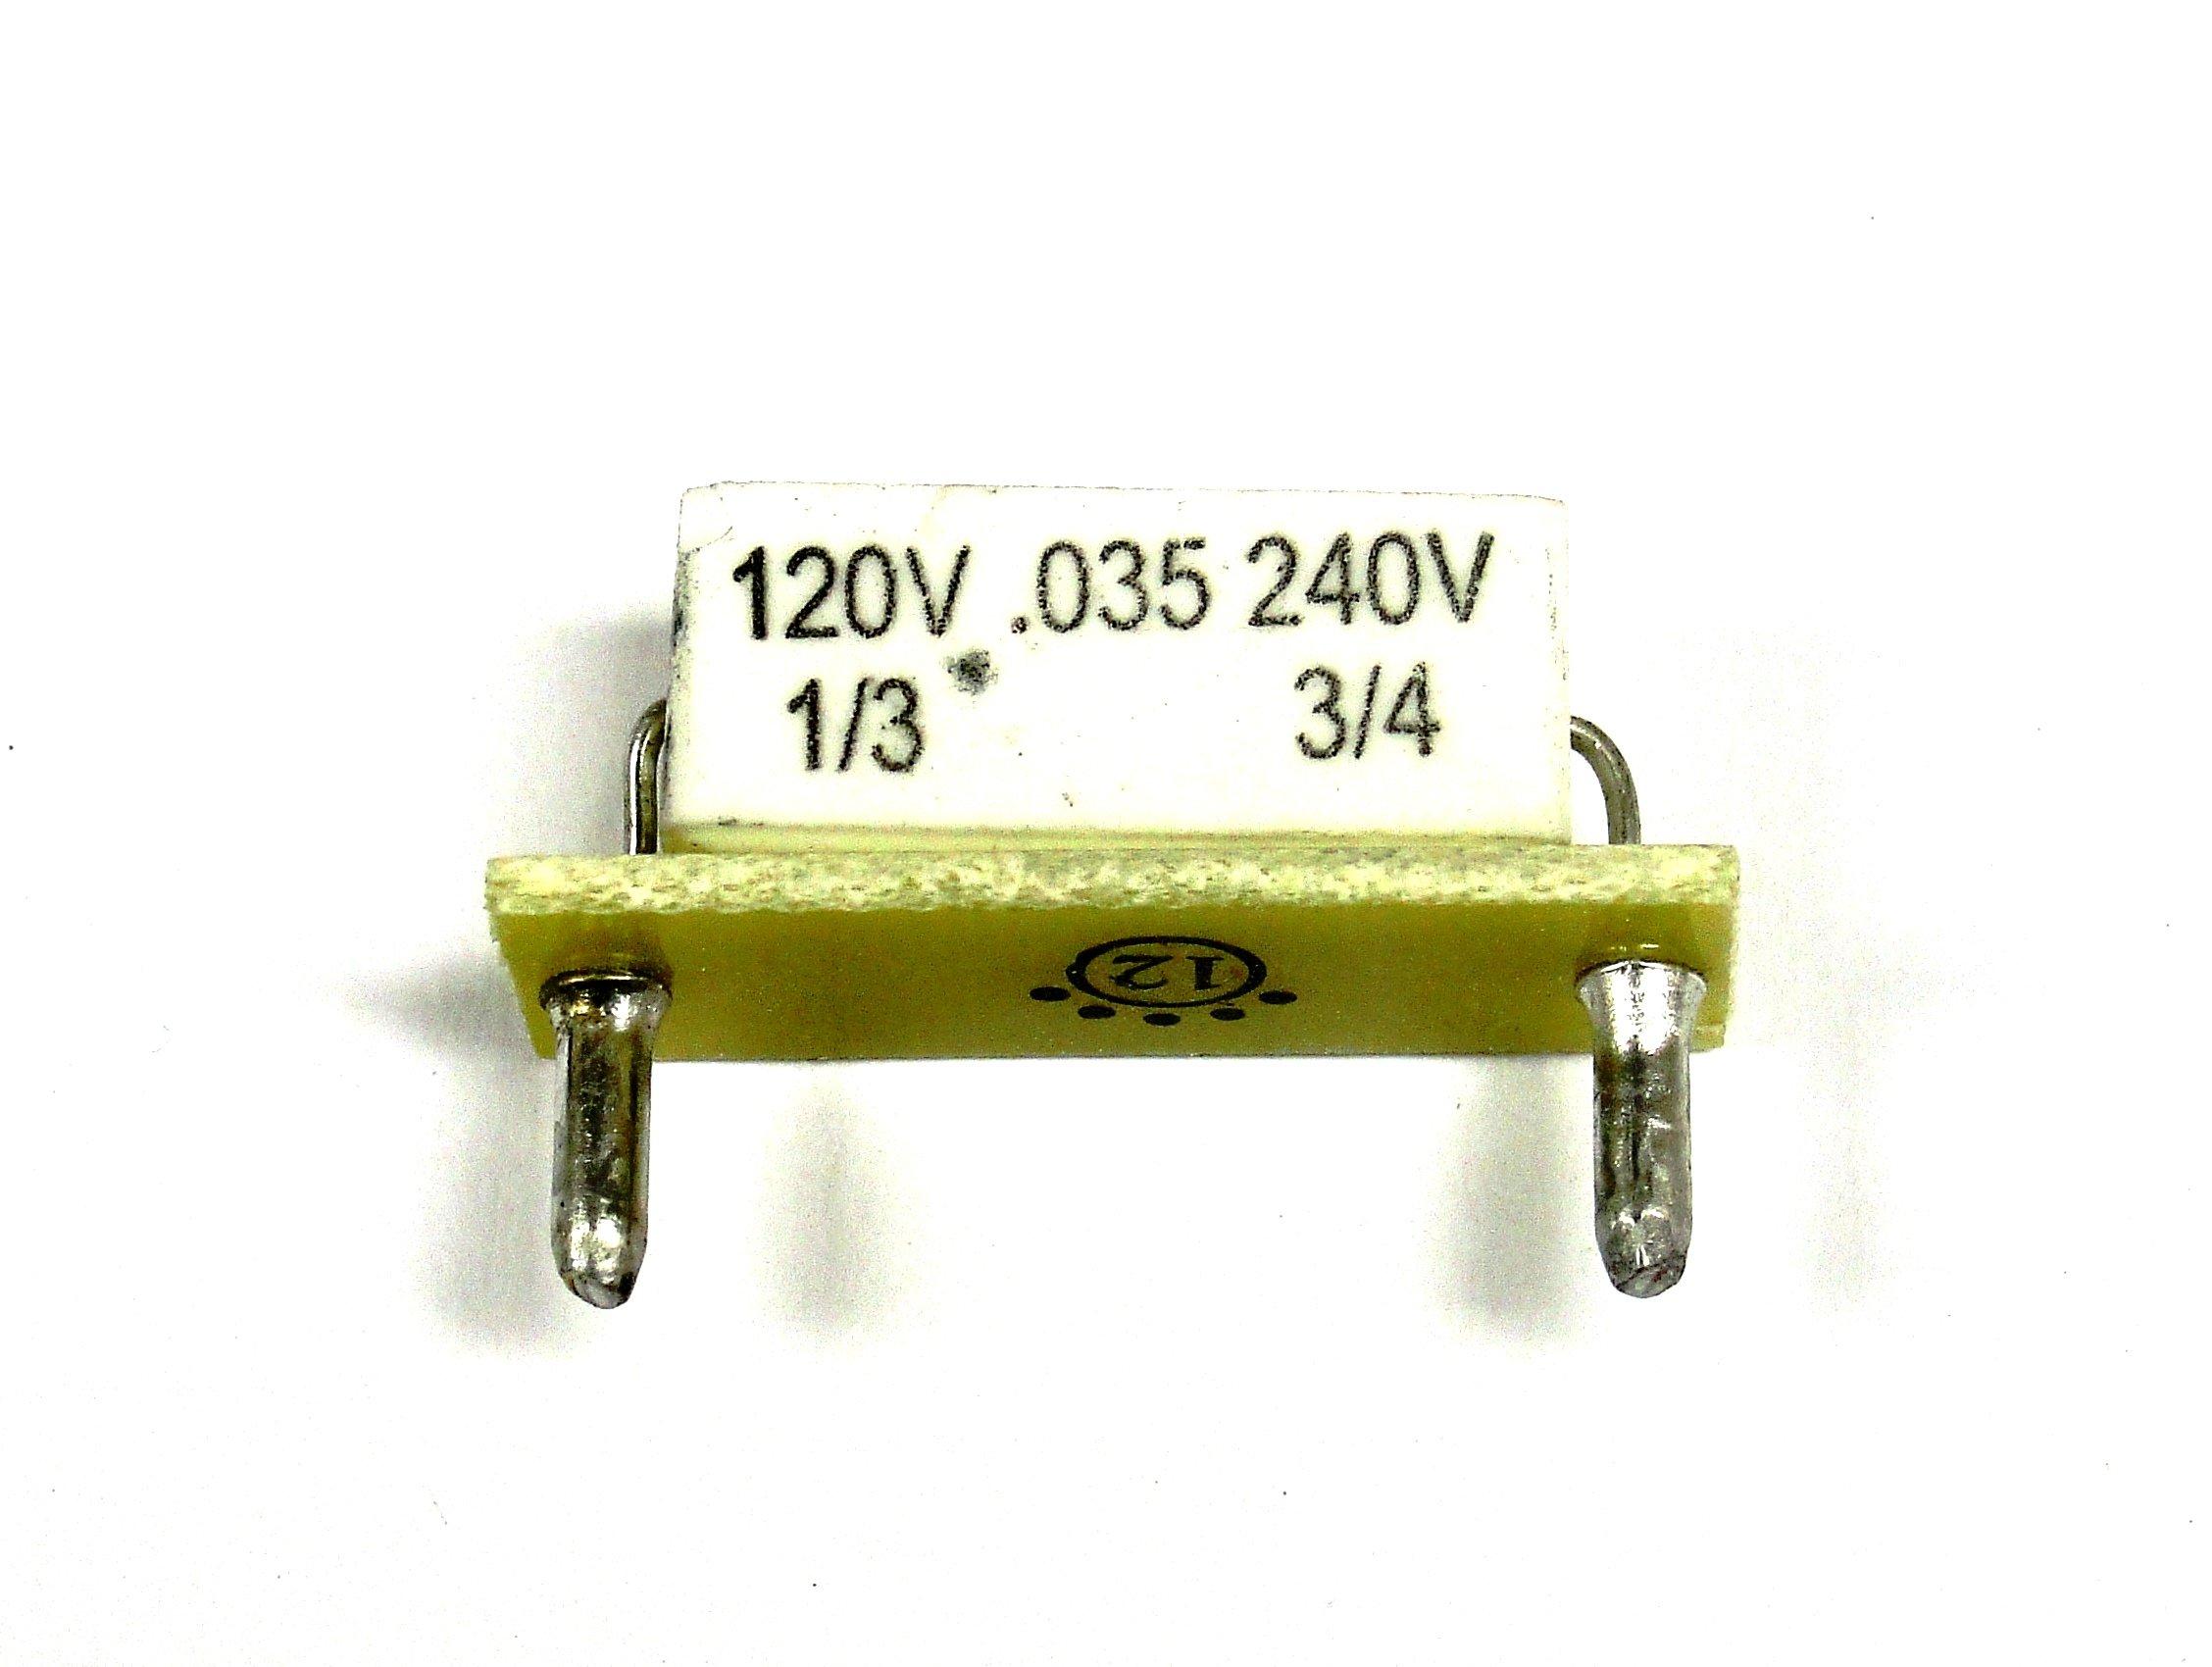 Plug-In Horsepower Resistor (9840)